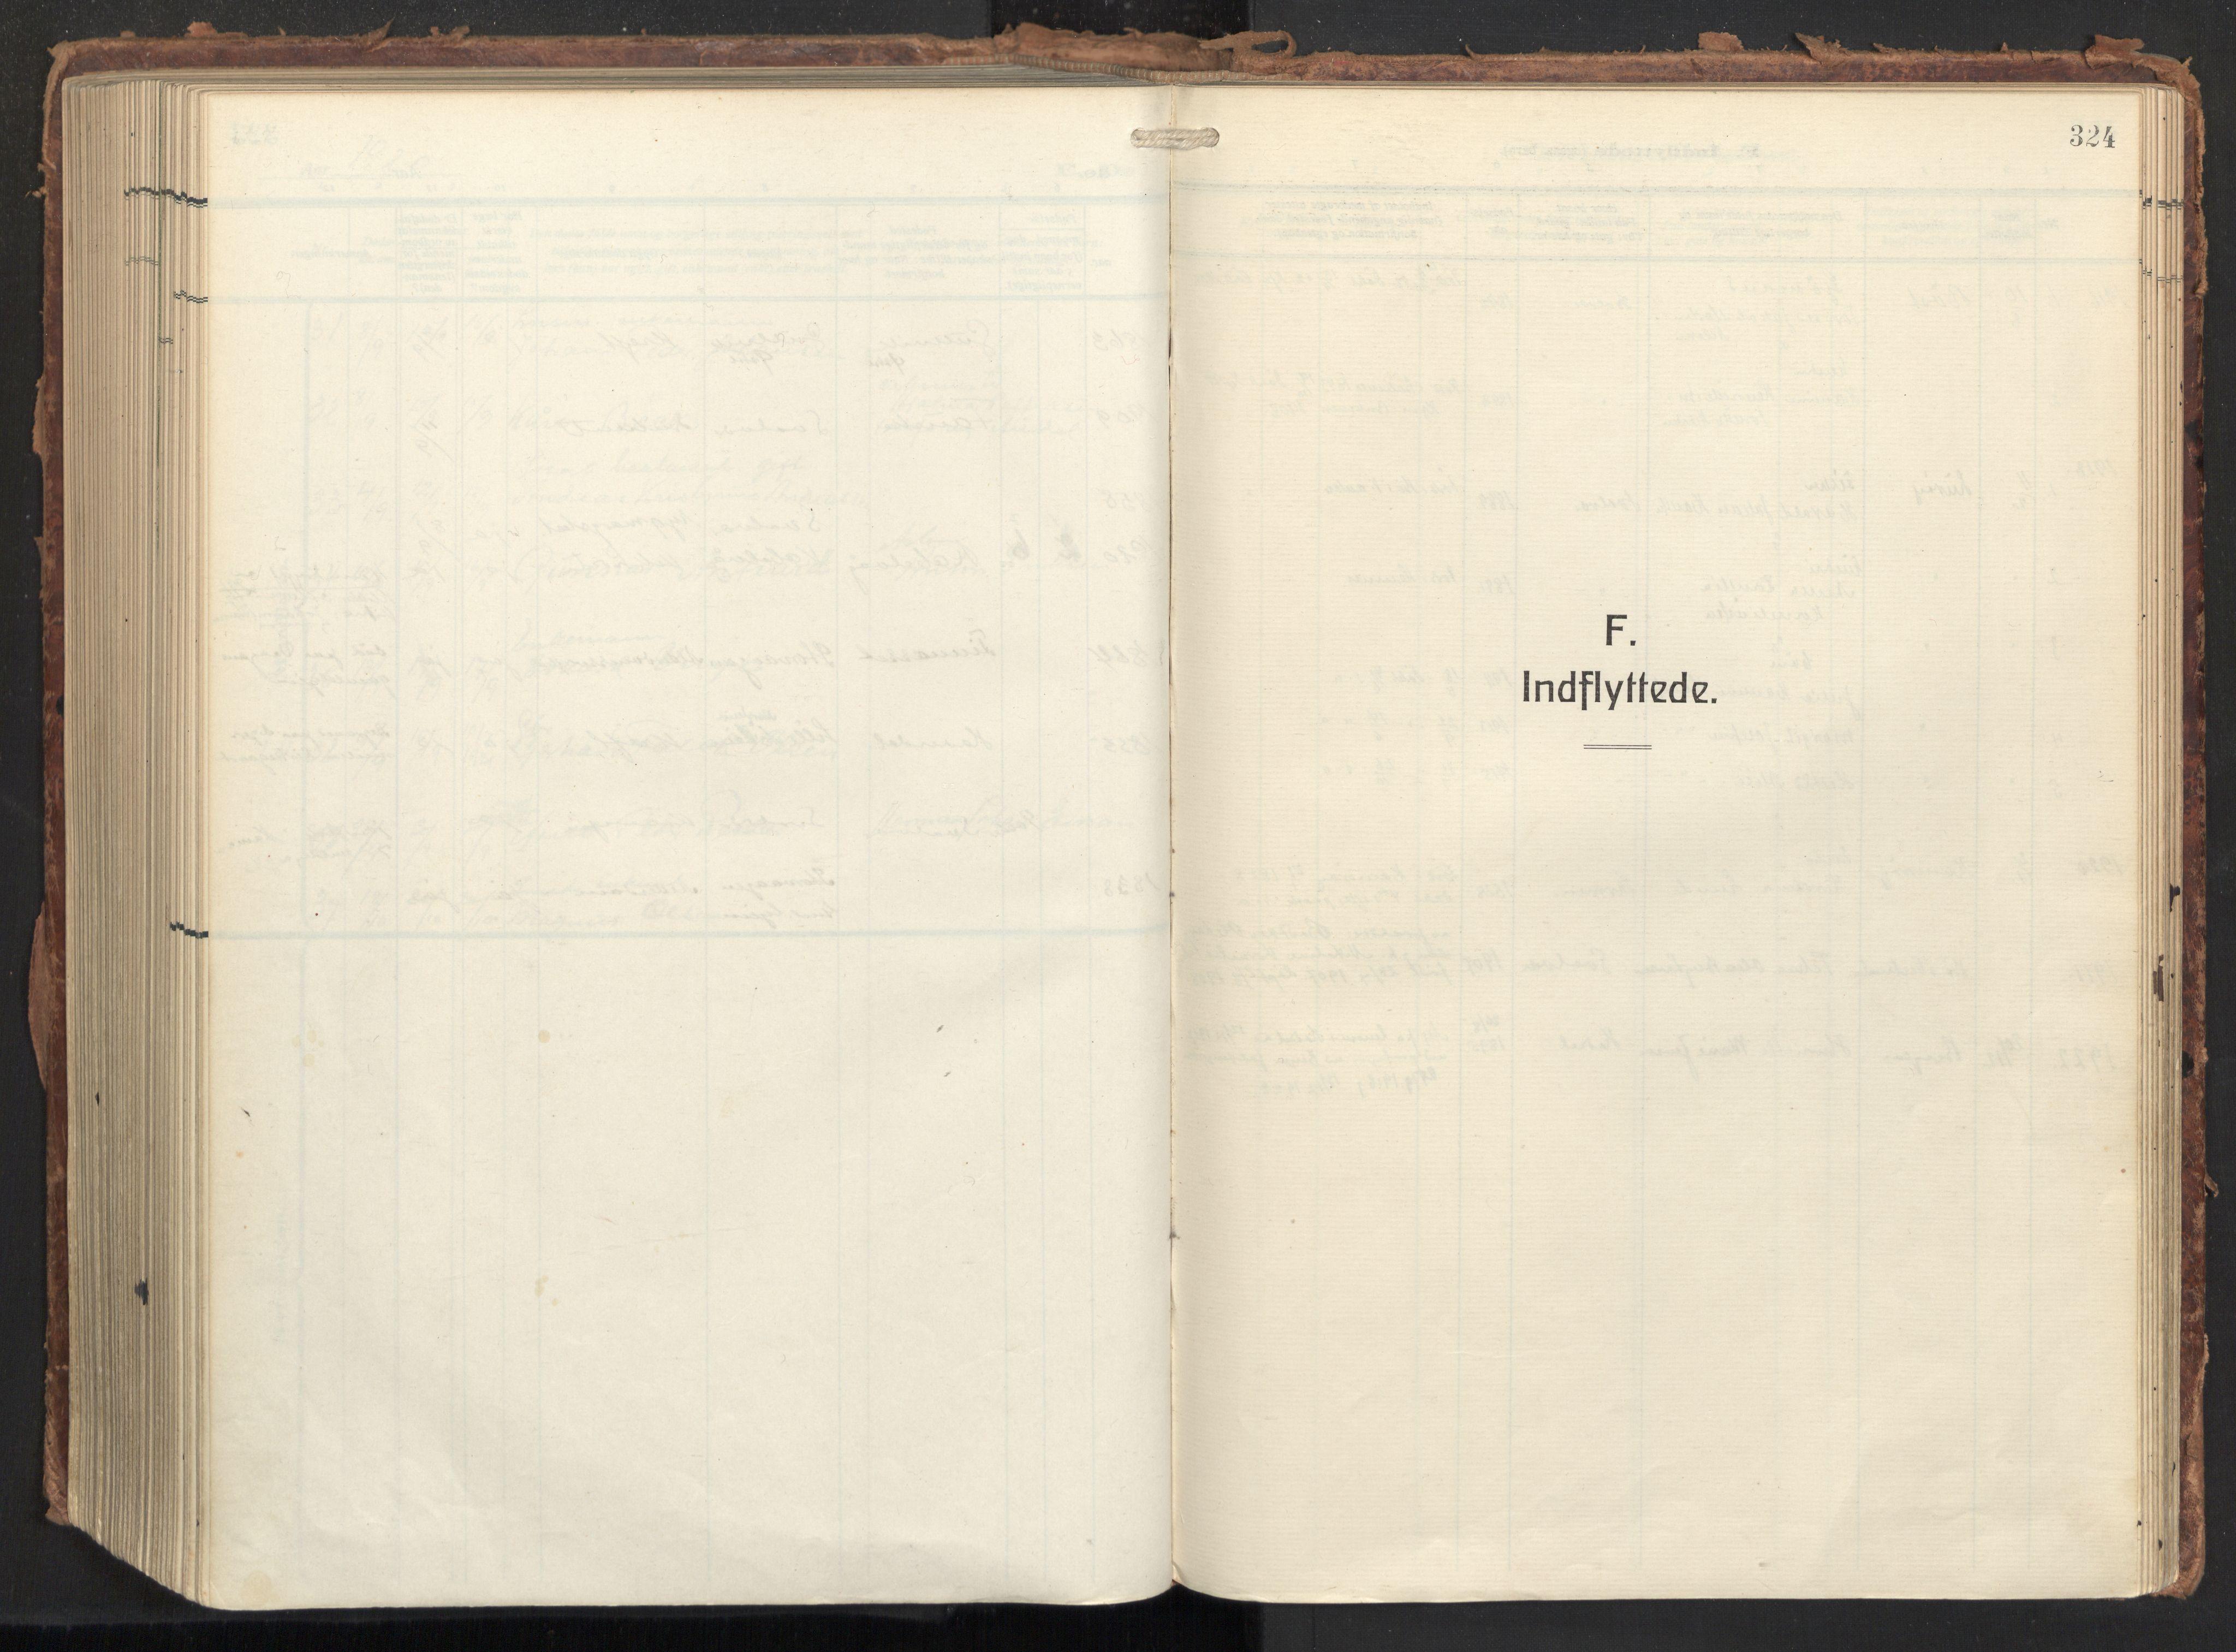 SAT, Ministerialprotokoller, klokkerbøker og fødselsregistre - Nordland, 874/L1064: Ministerialbok nr. 874A08, 1915-1926, s. 324